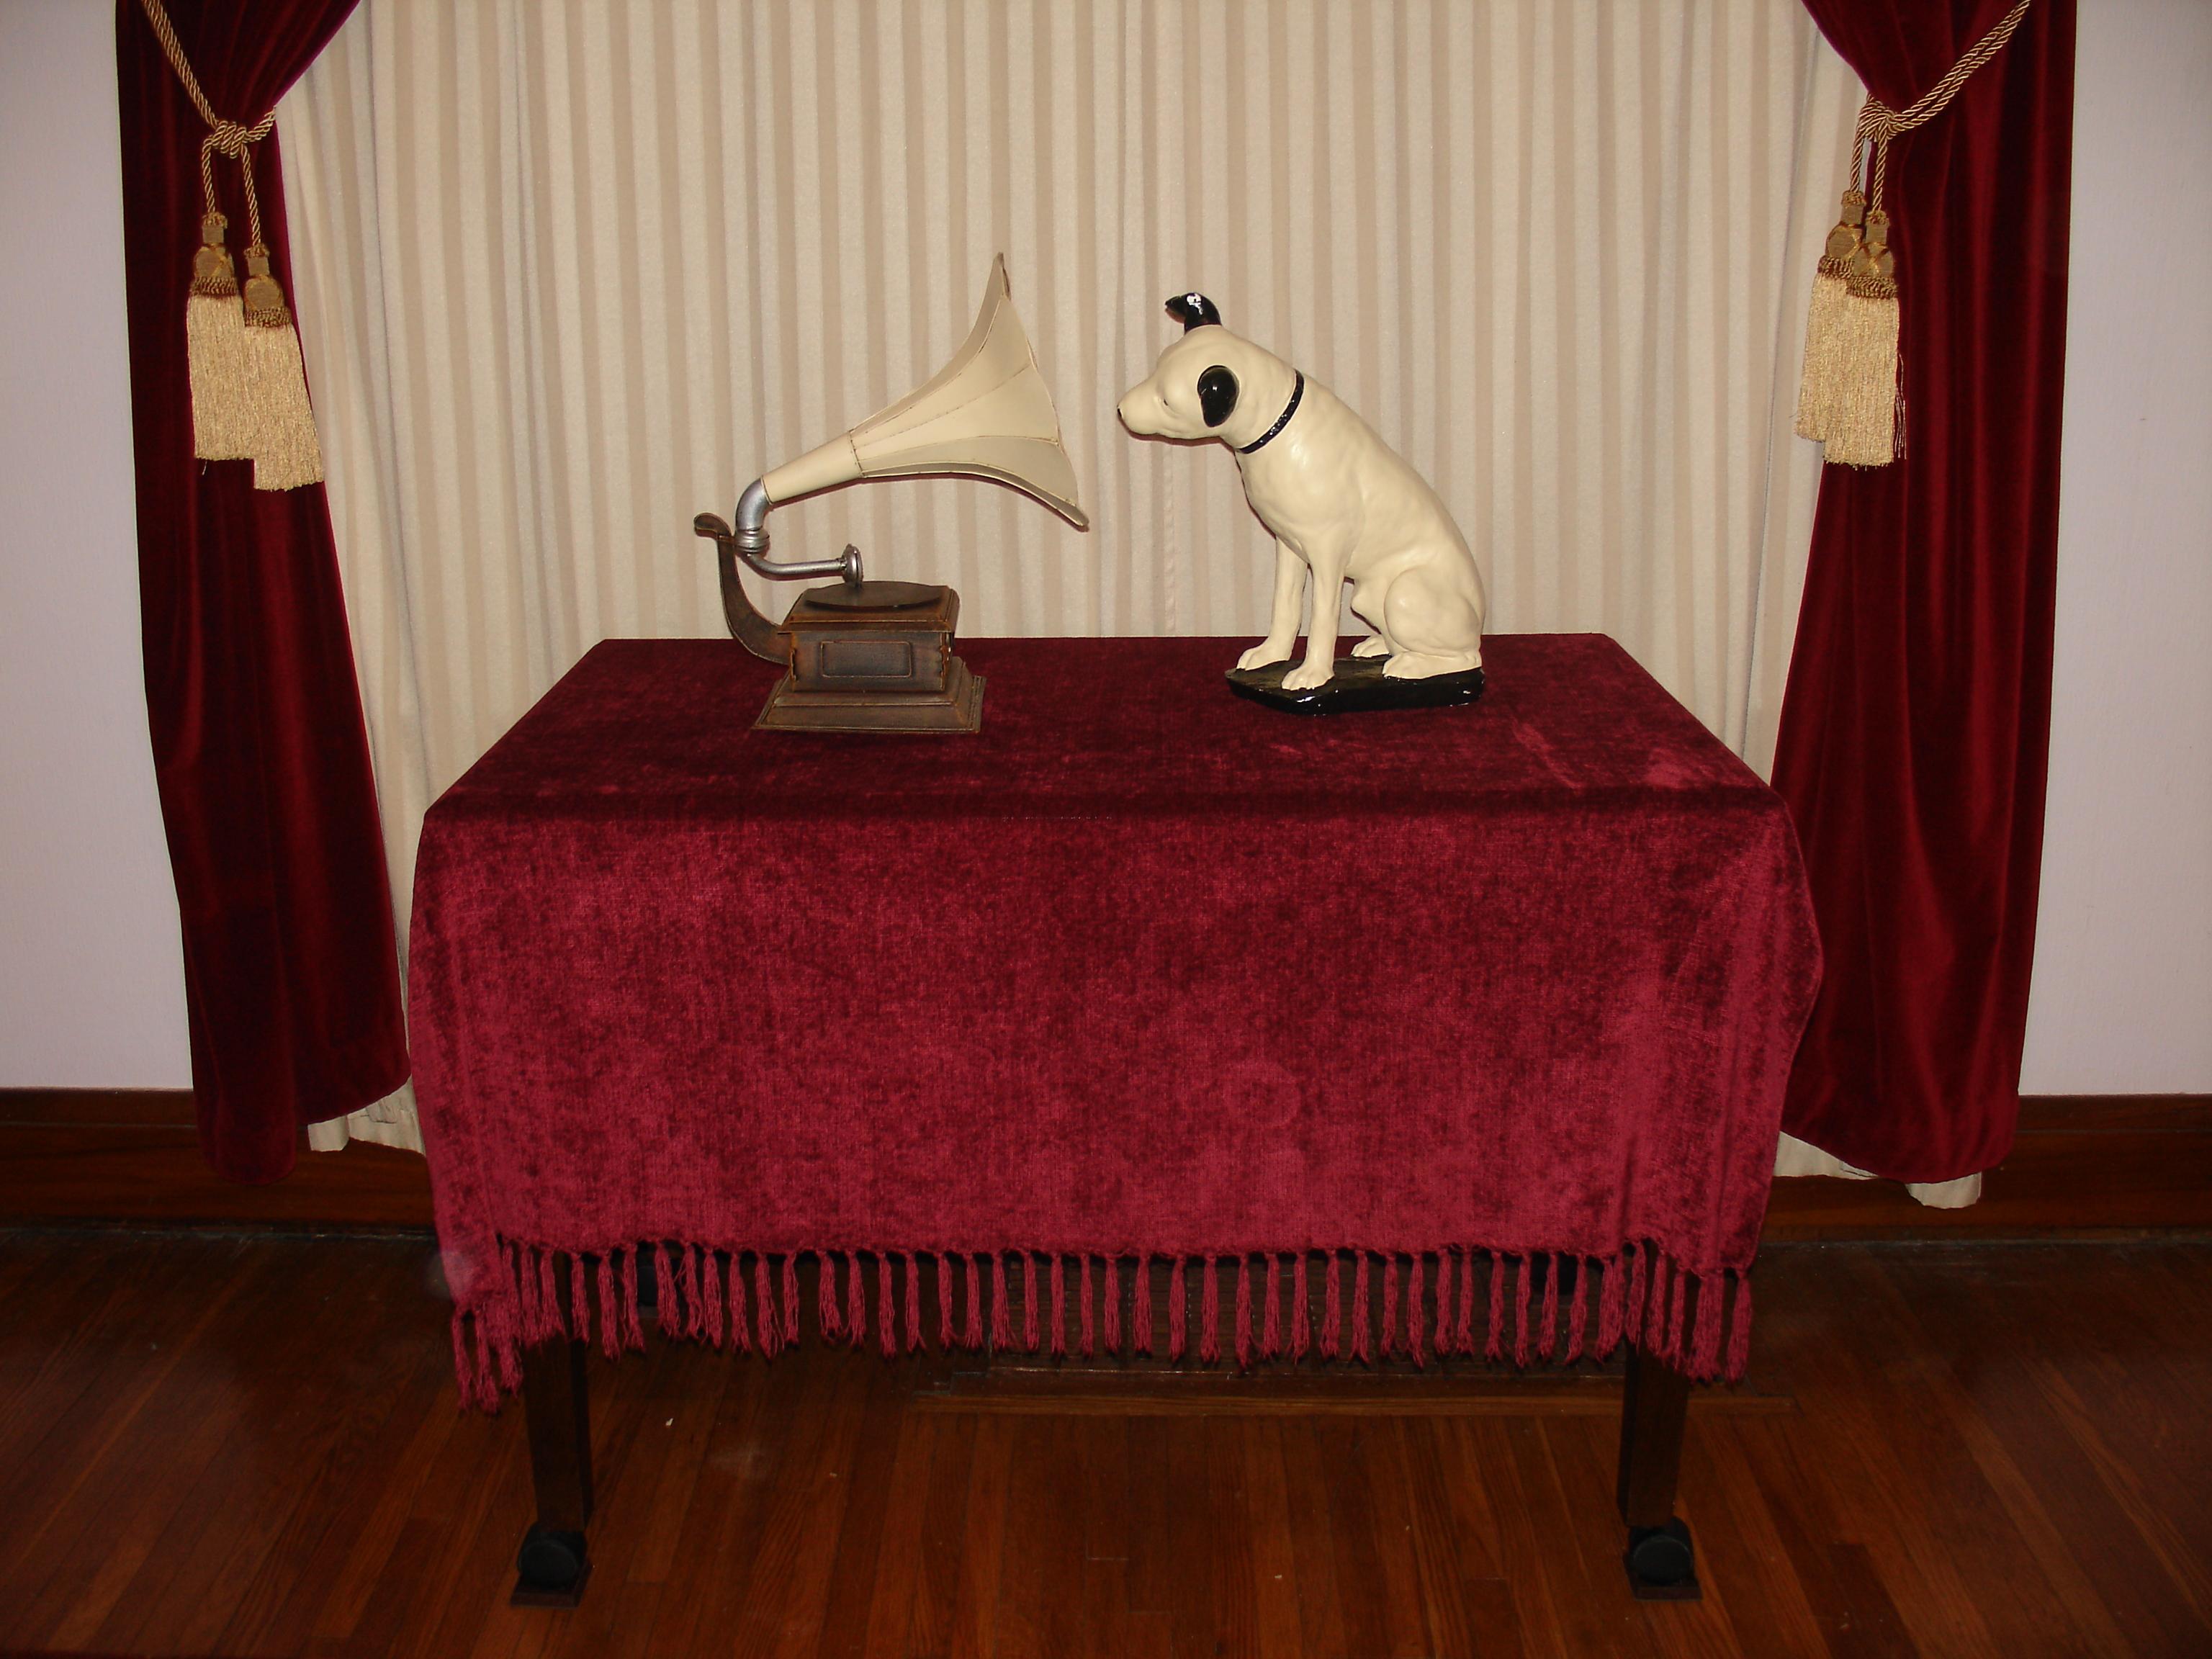 Chalkware Century Old Nipper and 1911 Monarch Replica Gramophone 02-12-19 - Wide Window Shot